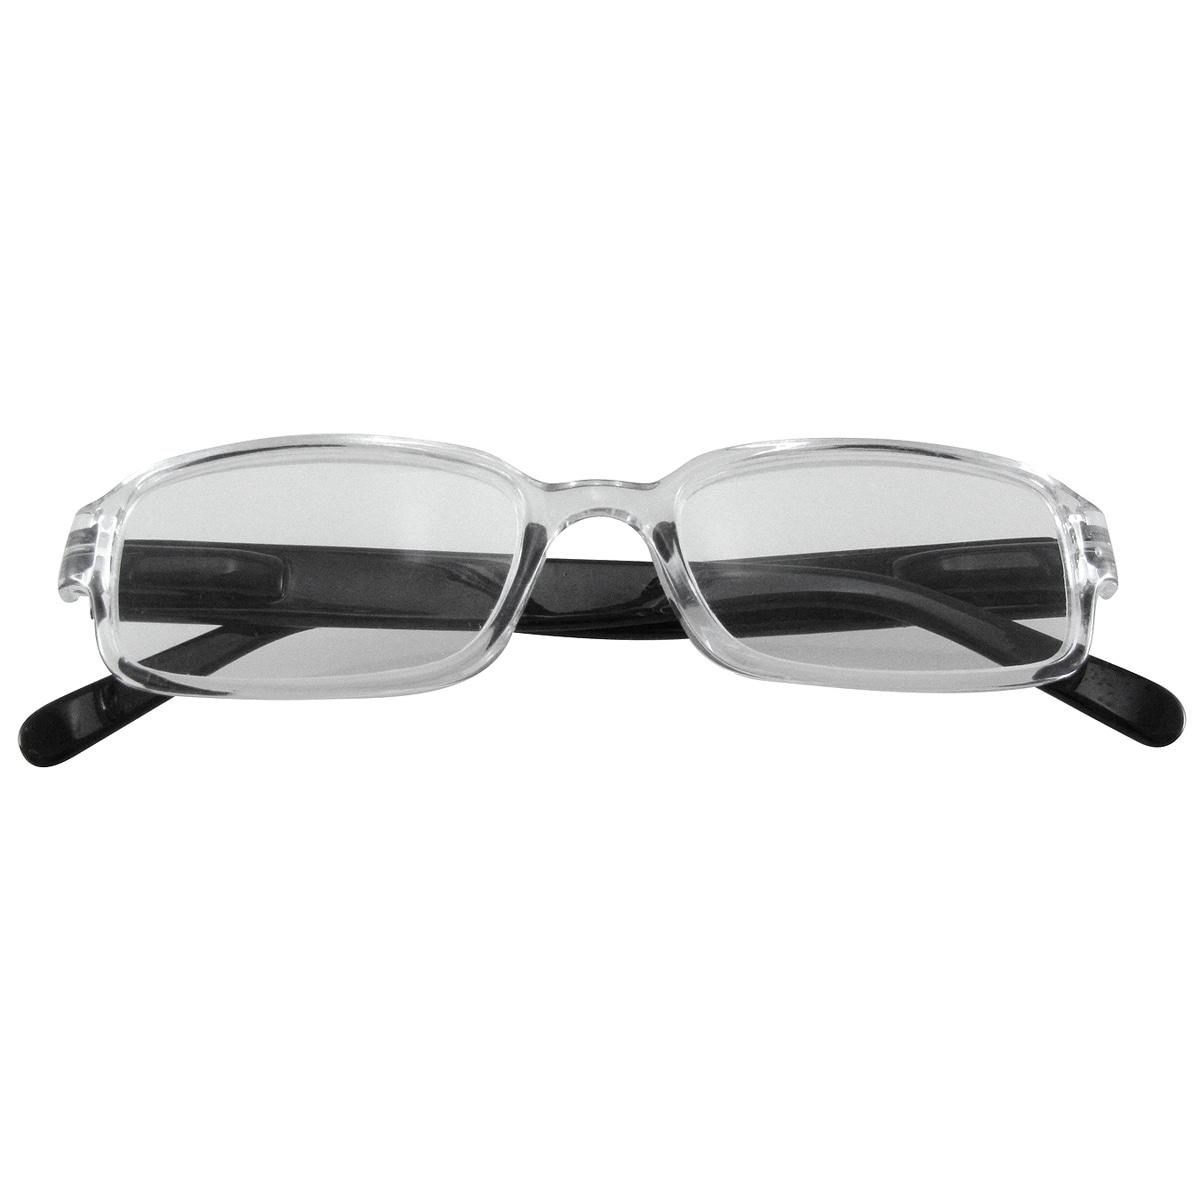 E-specs by Evolutioneyes Black Computer Glasses